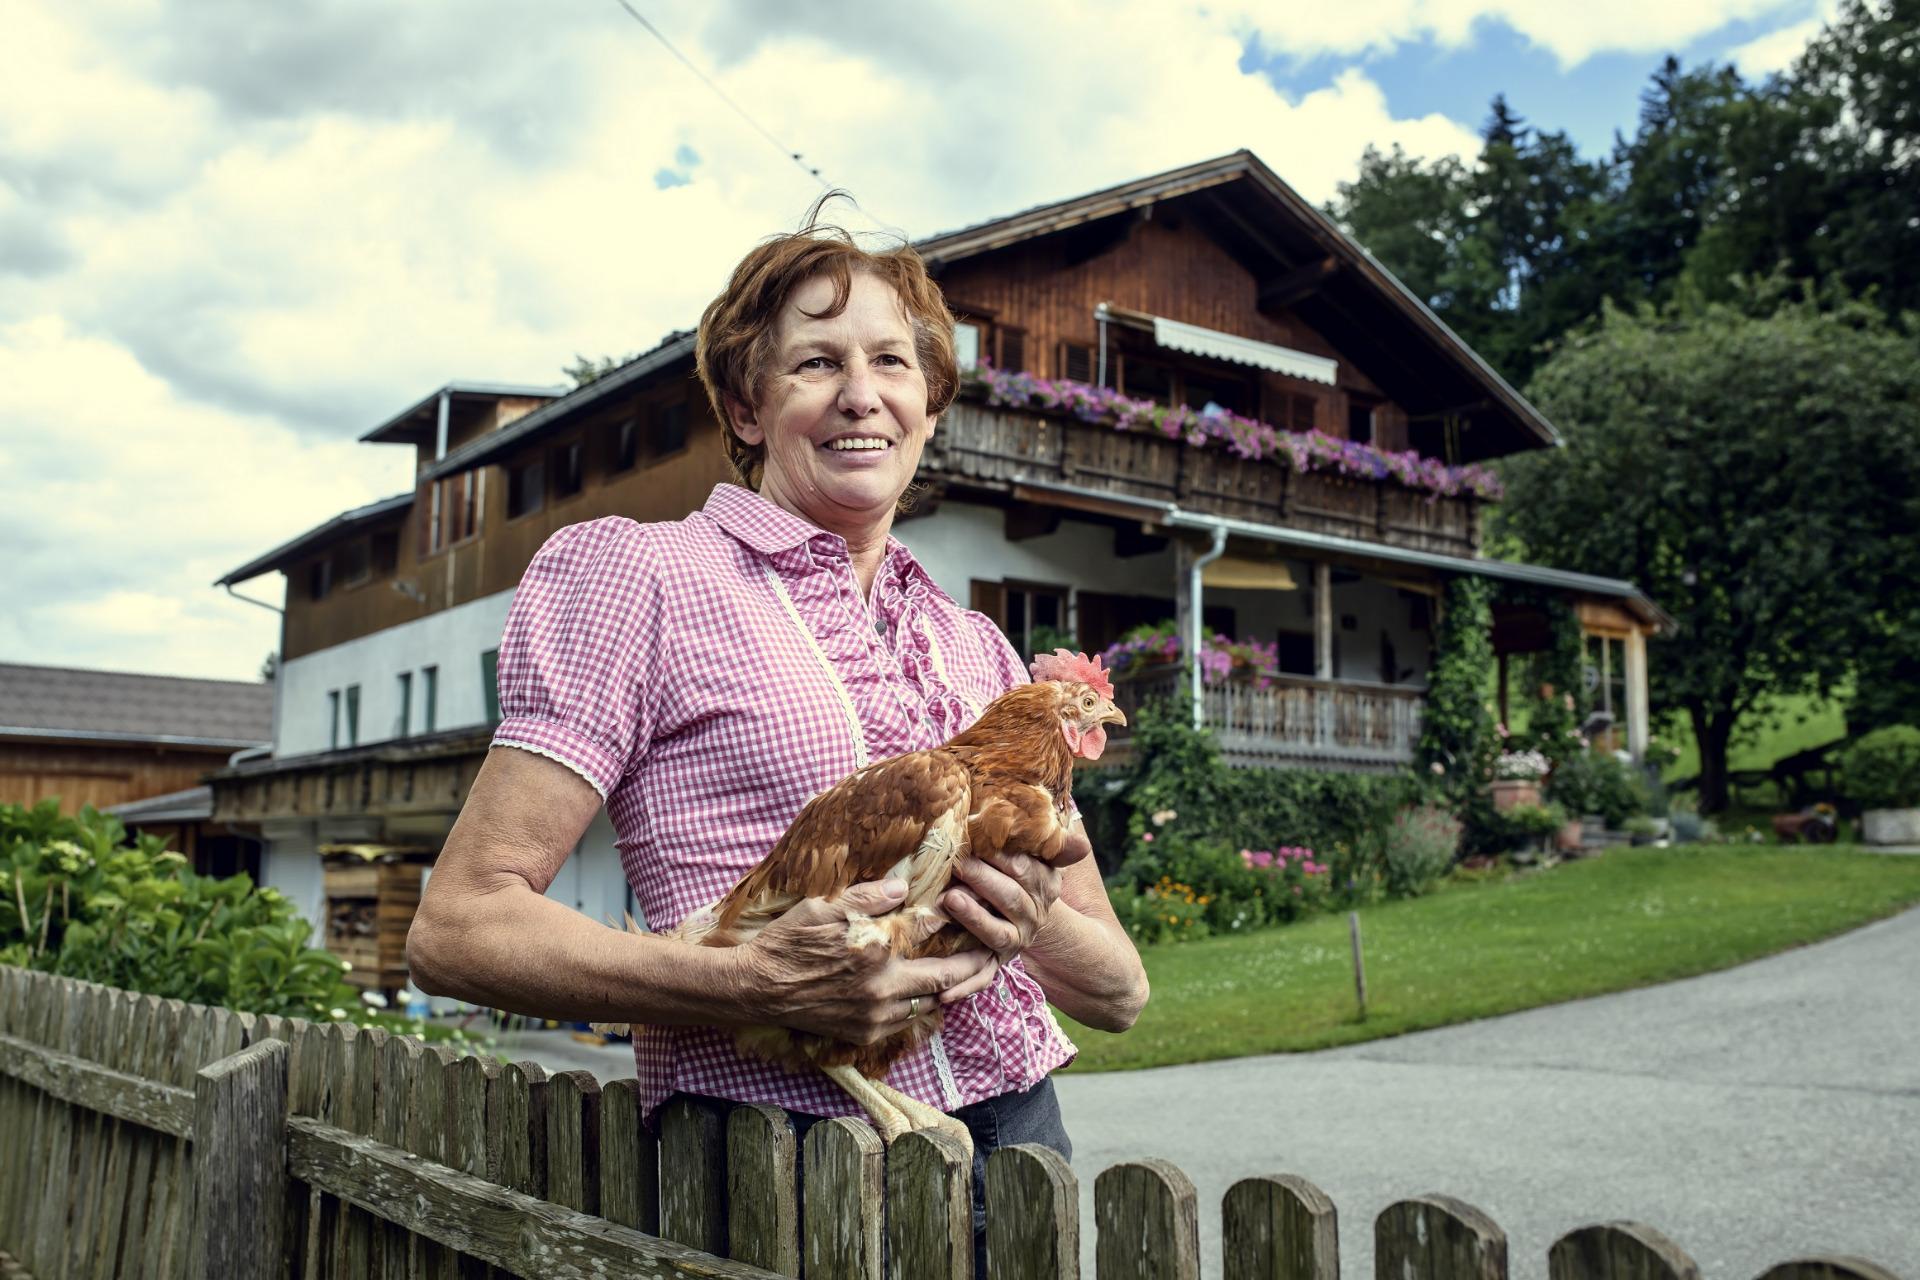 Bekanntschaften in Hall in Tirol - Partnersuche & Kontakte